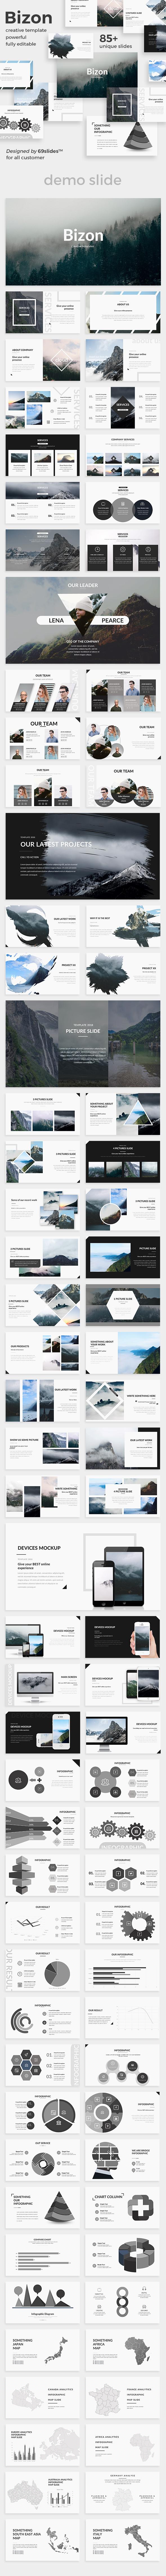 Bizon Creative Powerpoint Template - Creative PowerPoint Templates